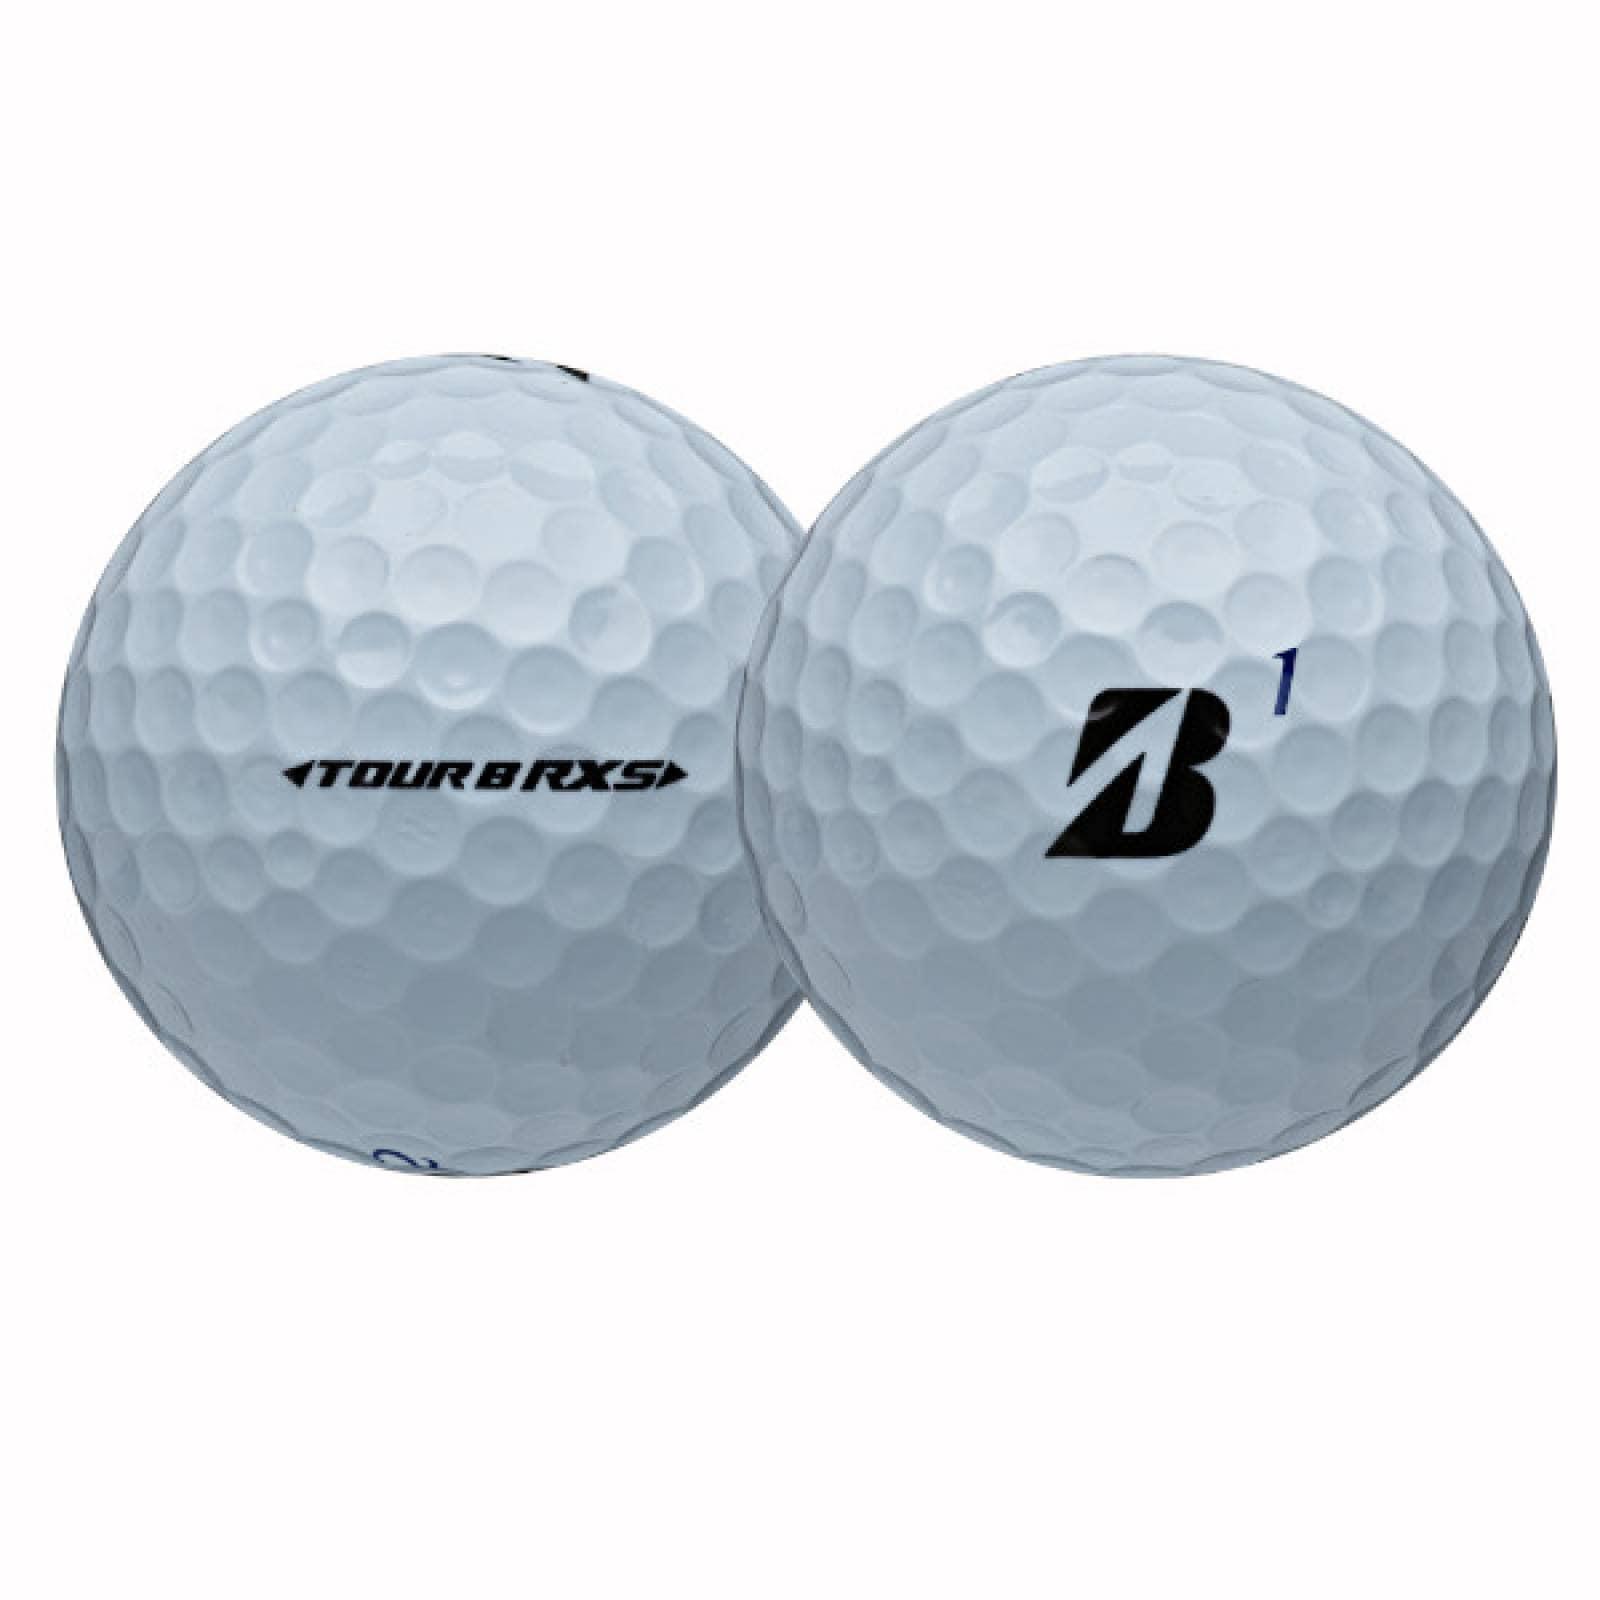 Docena de pelotas Bridgestone Golf Tour B RXS